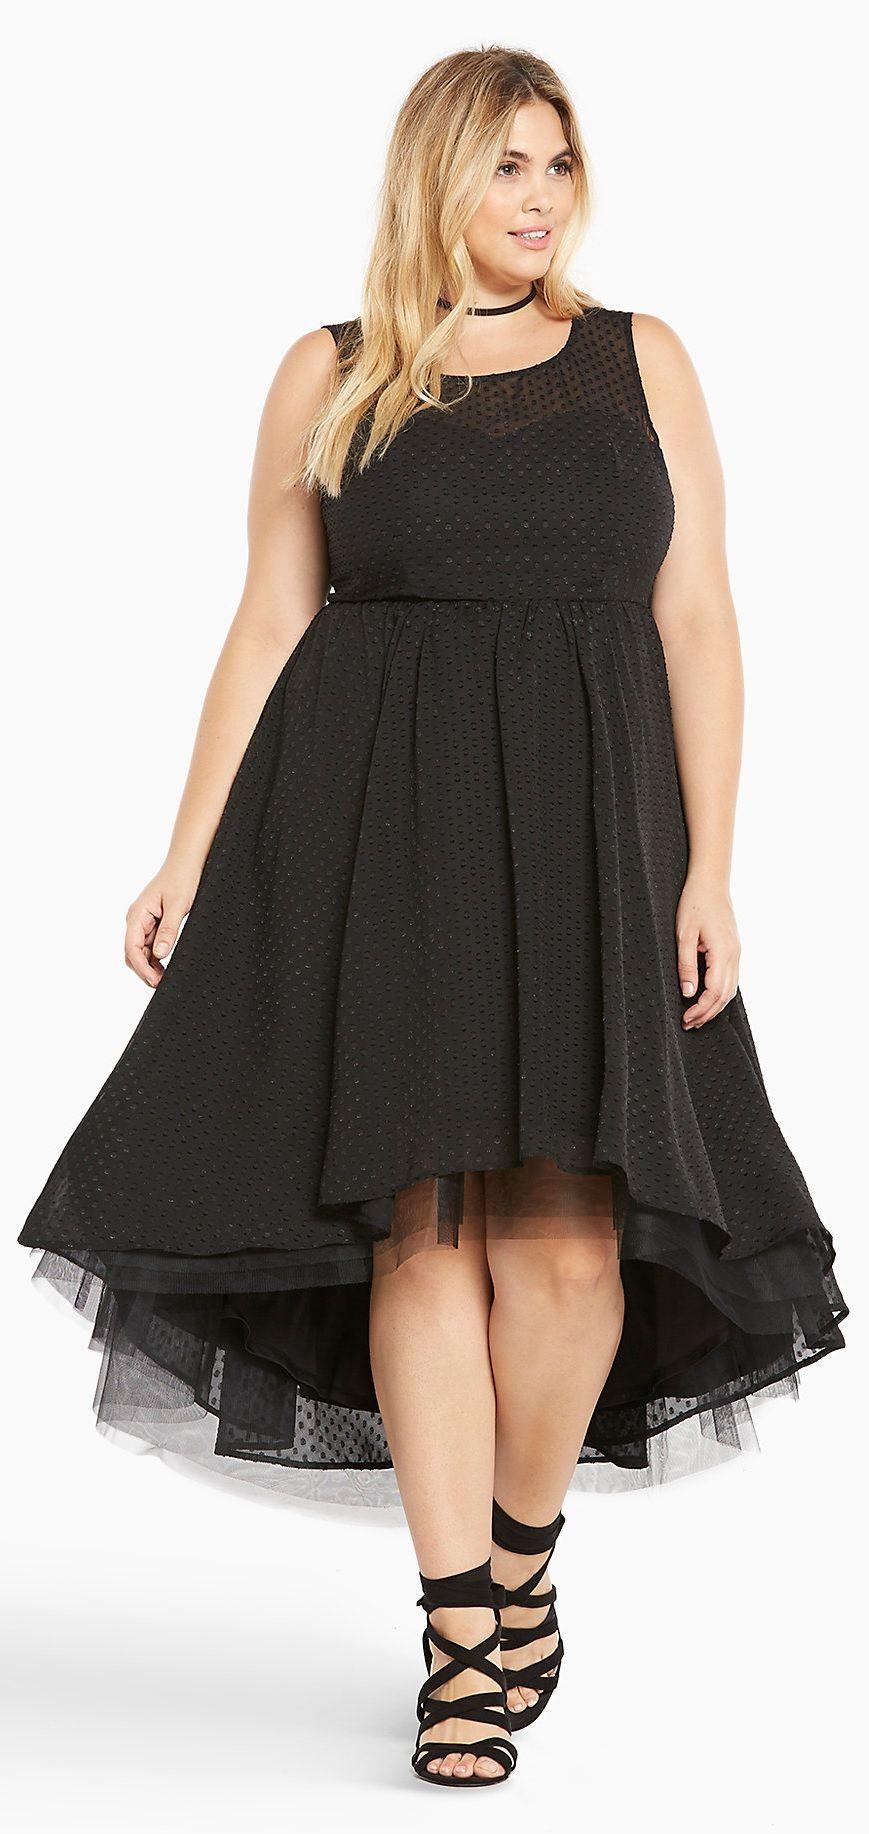 Plus Size Hi-Lo Chiffon Dress | Vintage looking dresses ...